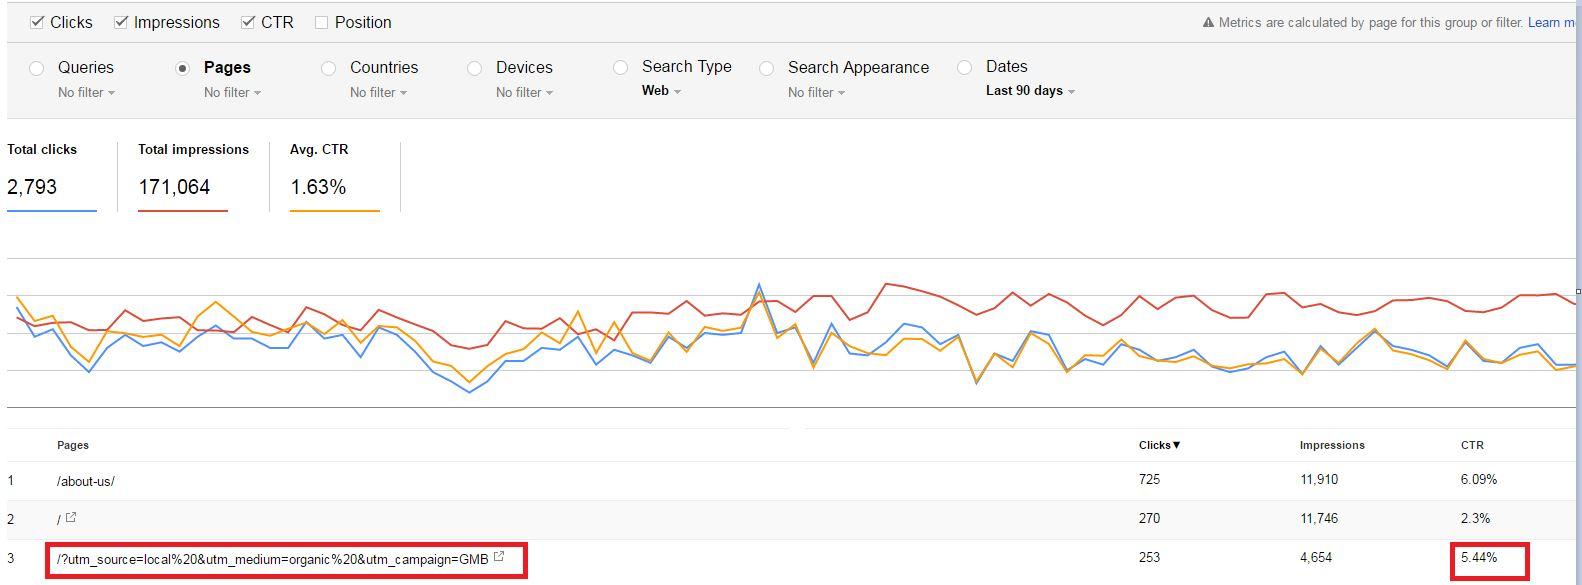 Google My Business Google Search Console Data - markscheets.com